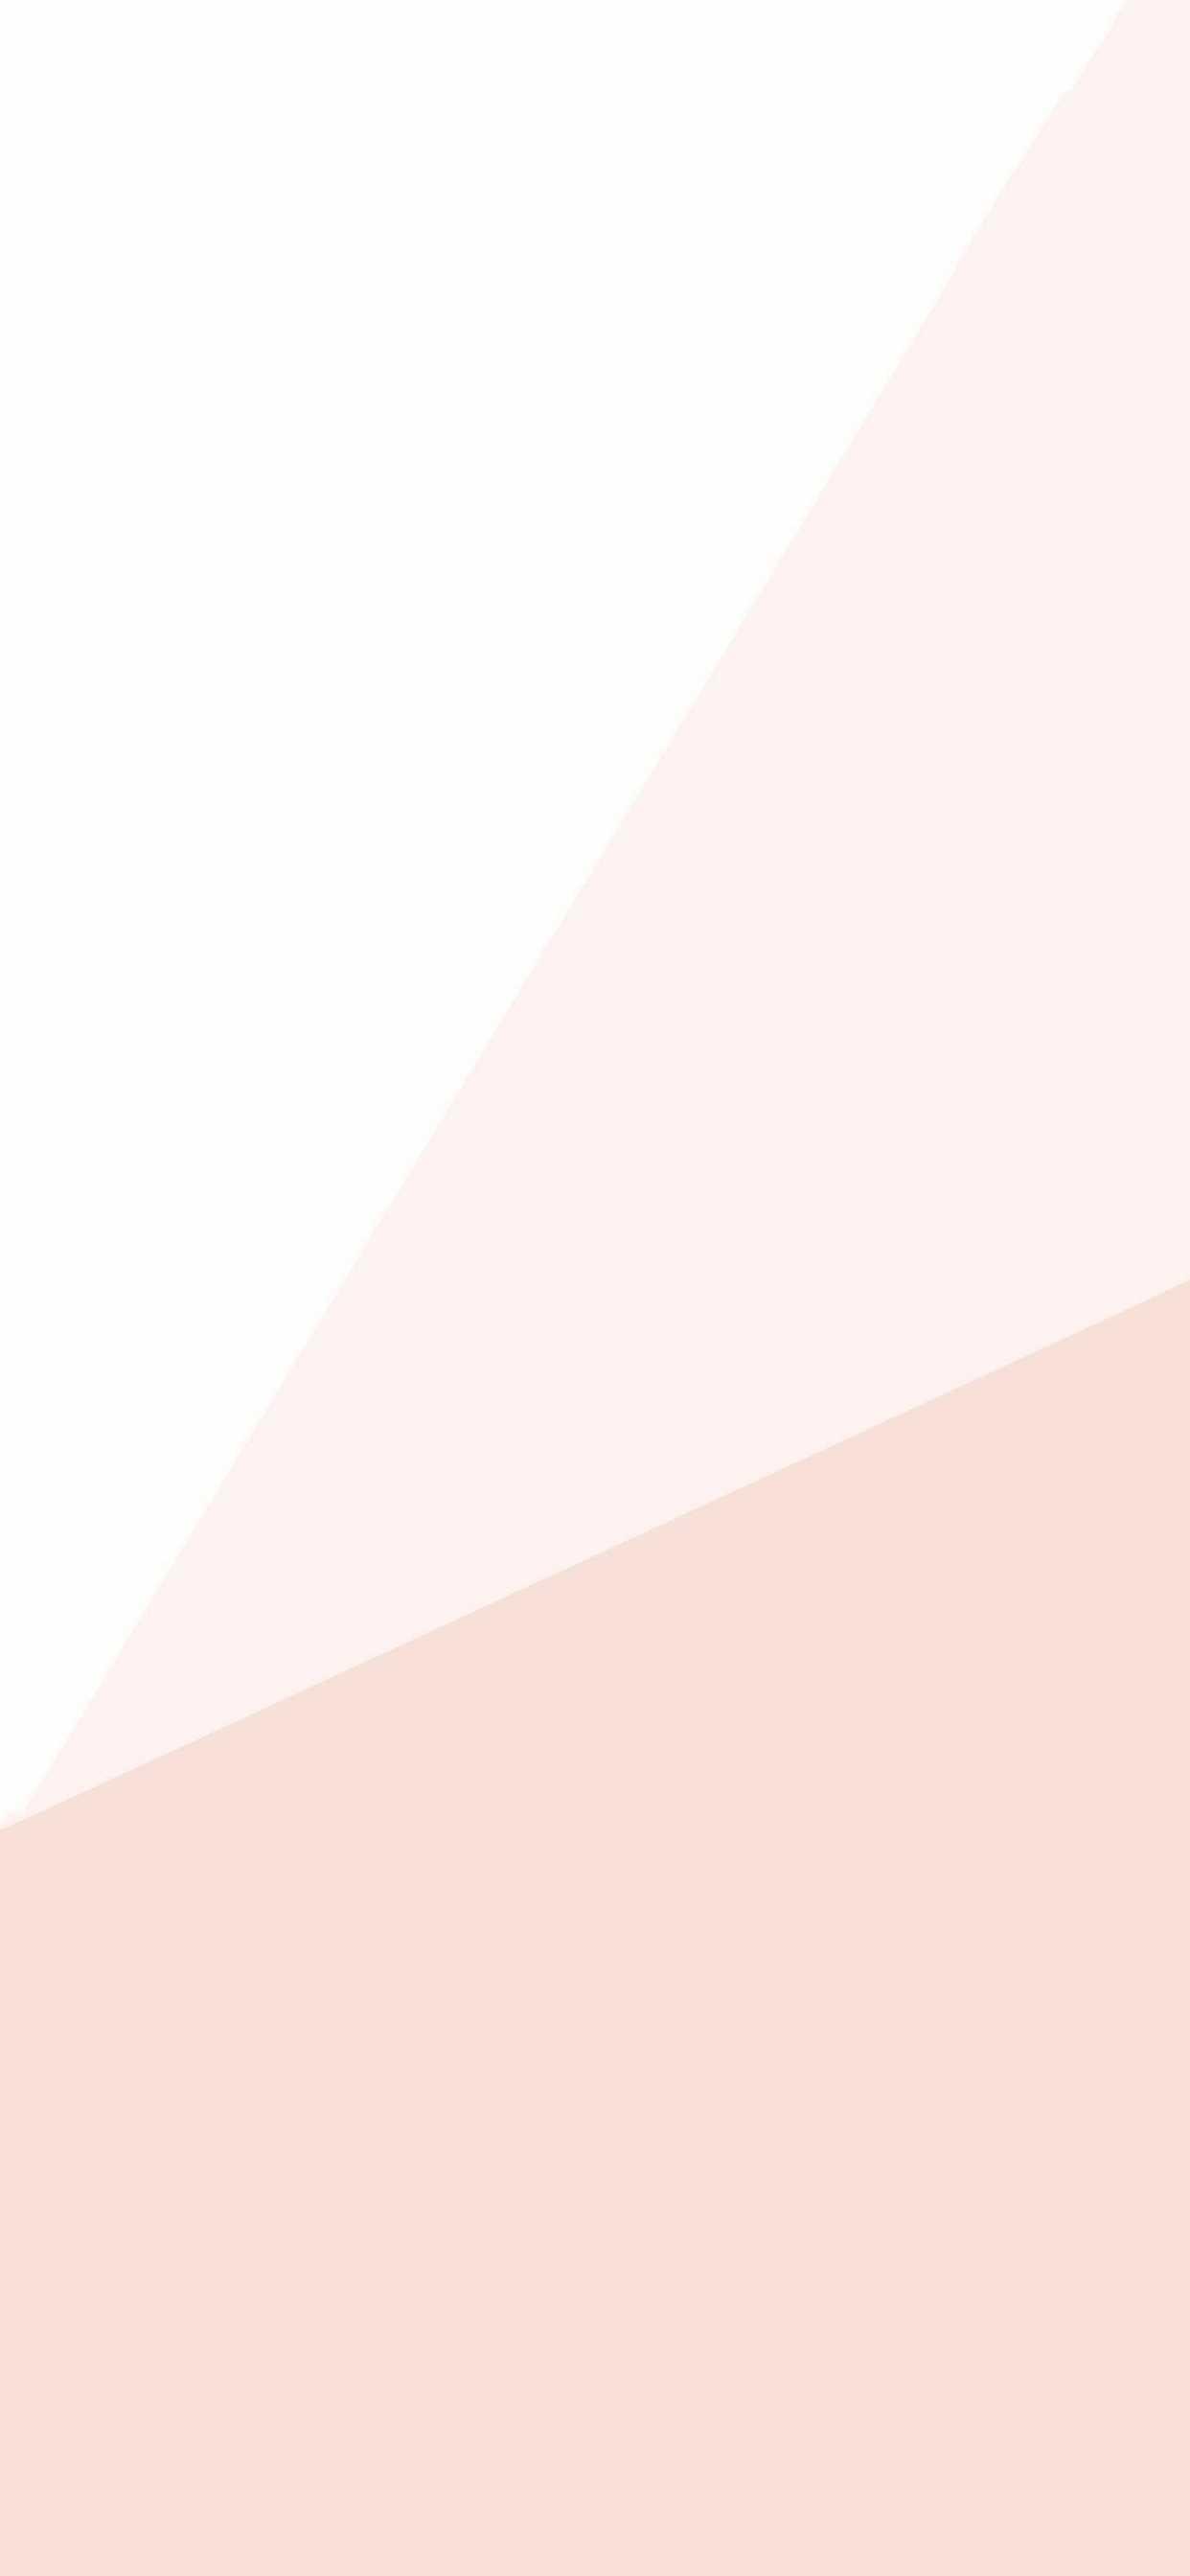 IPhone Pastel Colors Wallpaper   iXpap